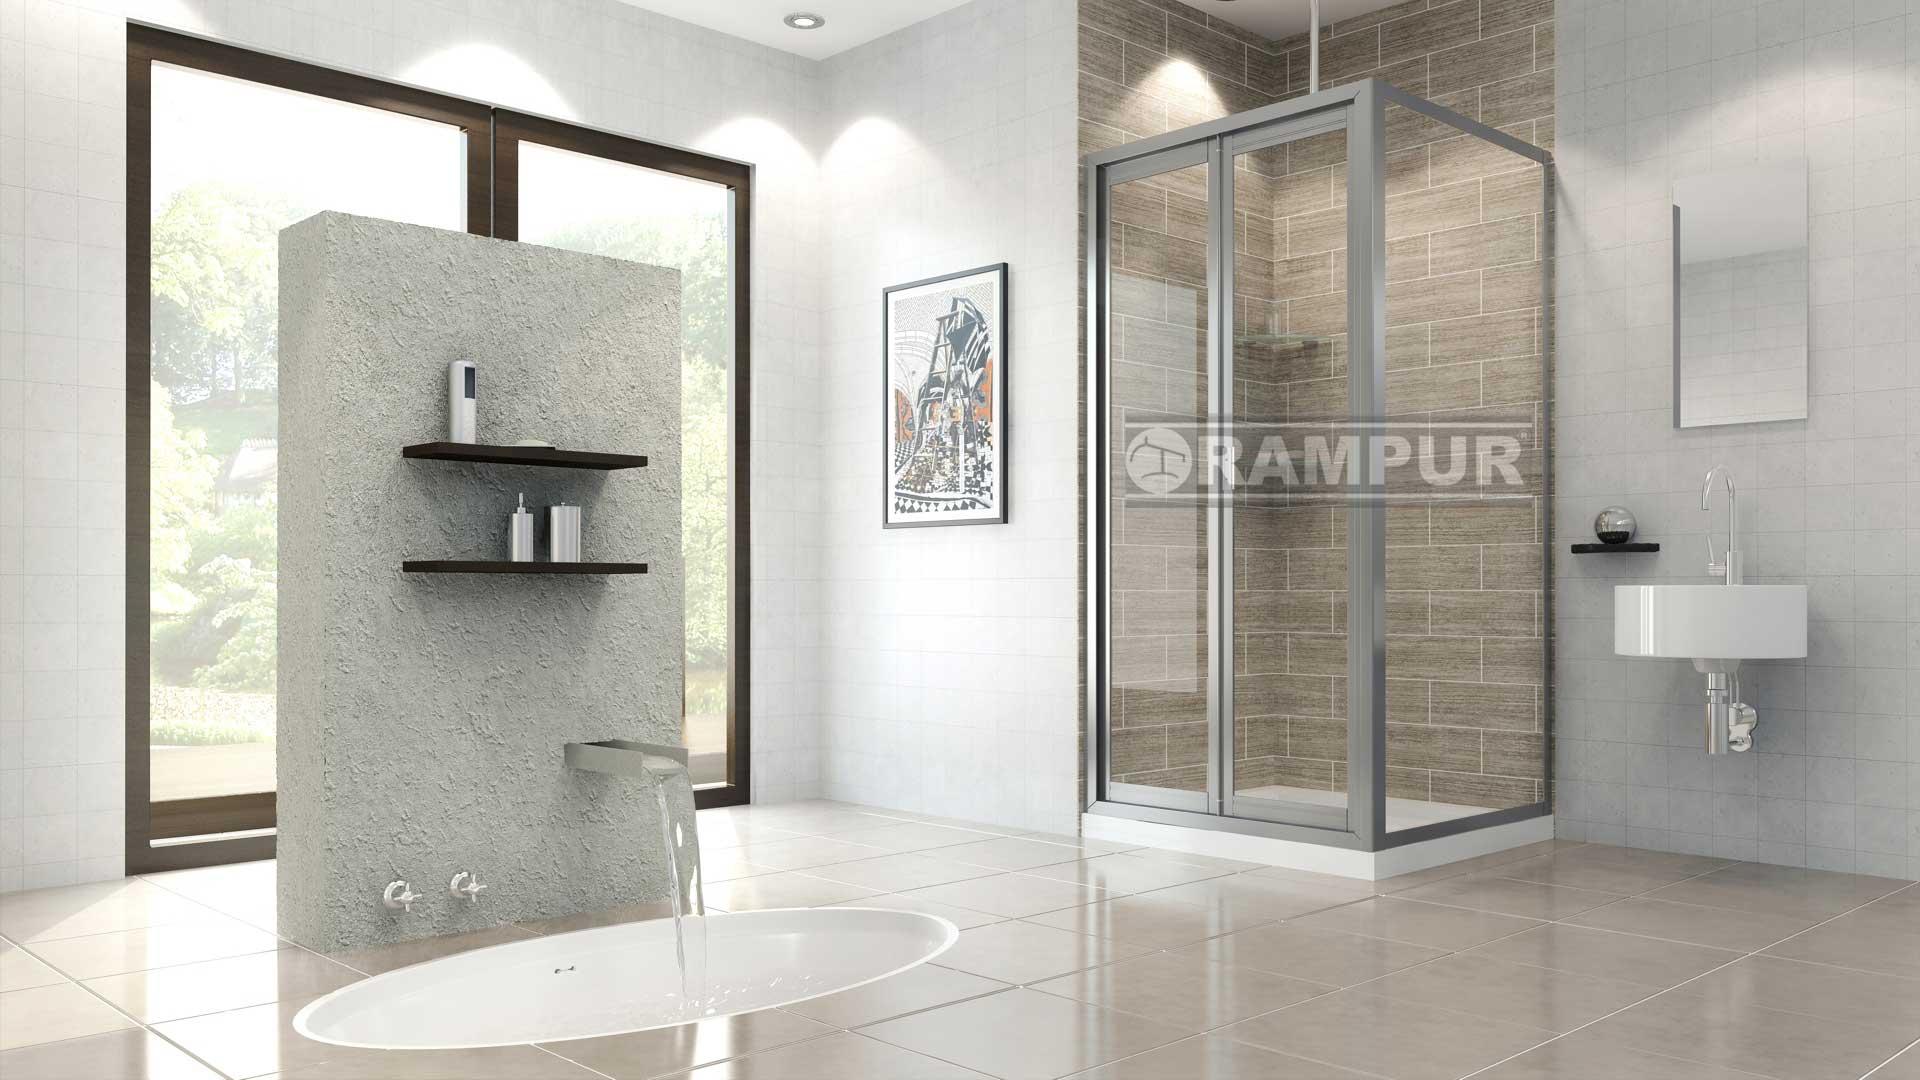 Rampur box puertas plegables vidrio tilcara premium for Box de ducha sodimac